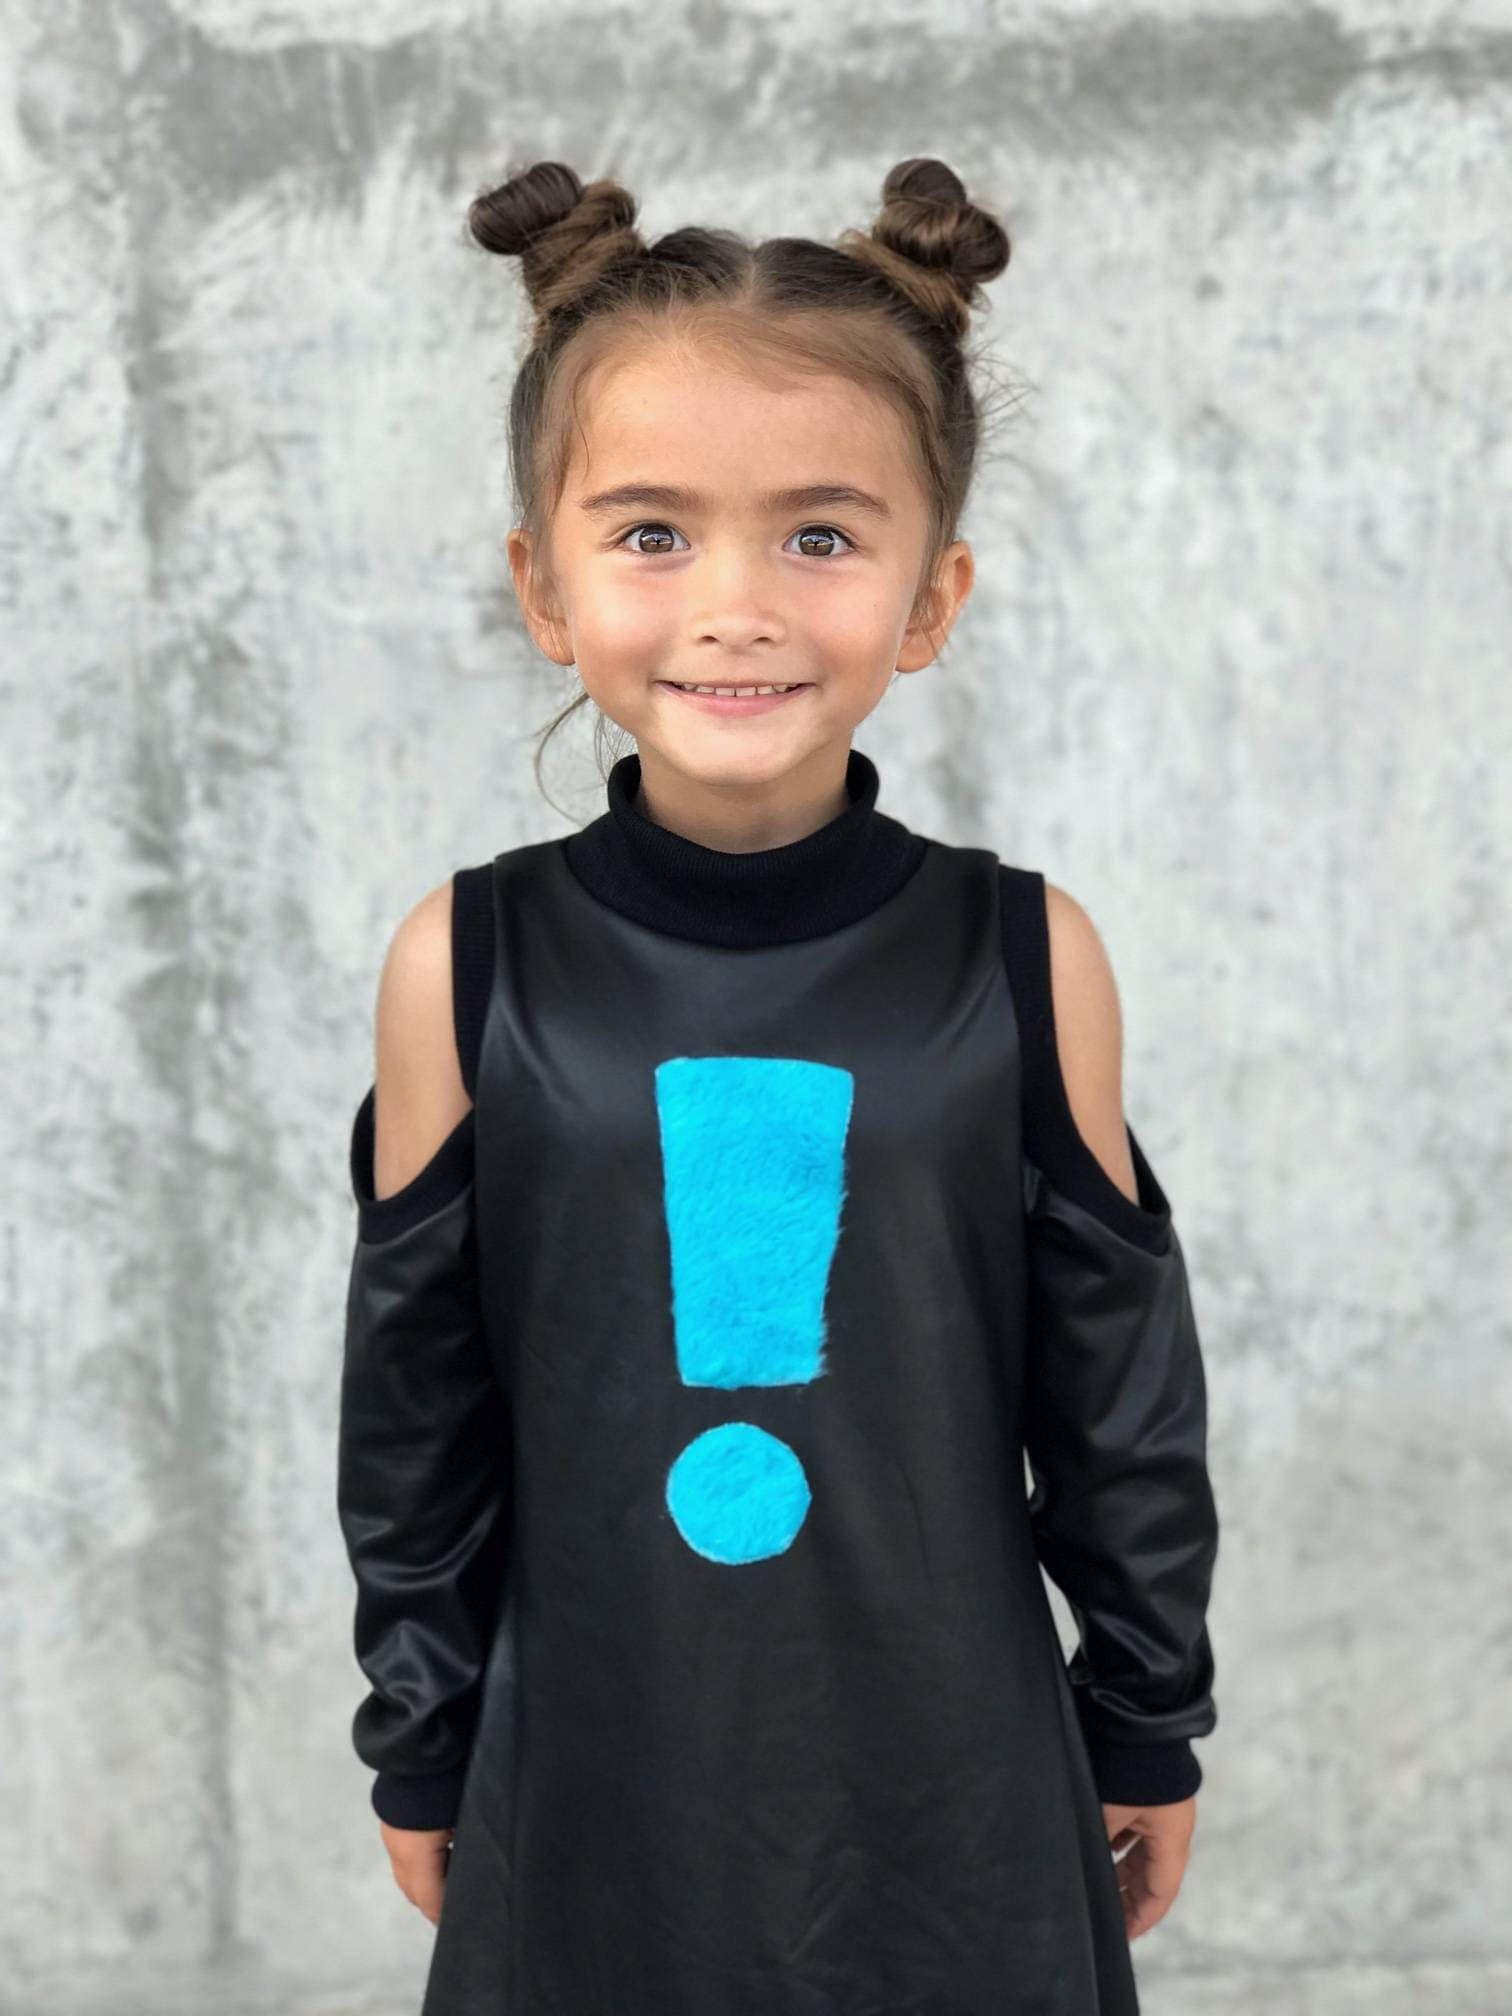 Girl Dress Toddler Dress Black Dress Monochrome Dress